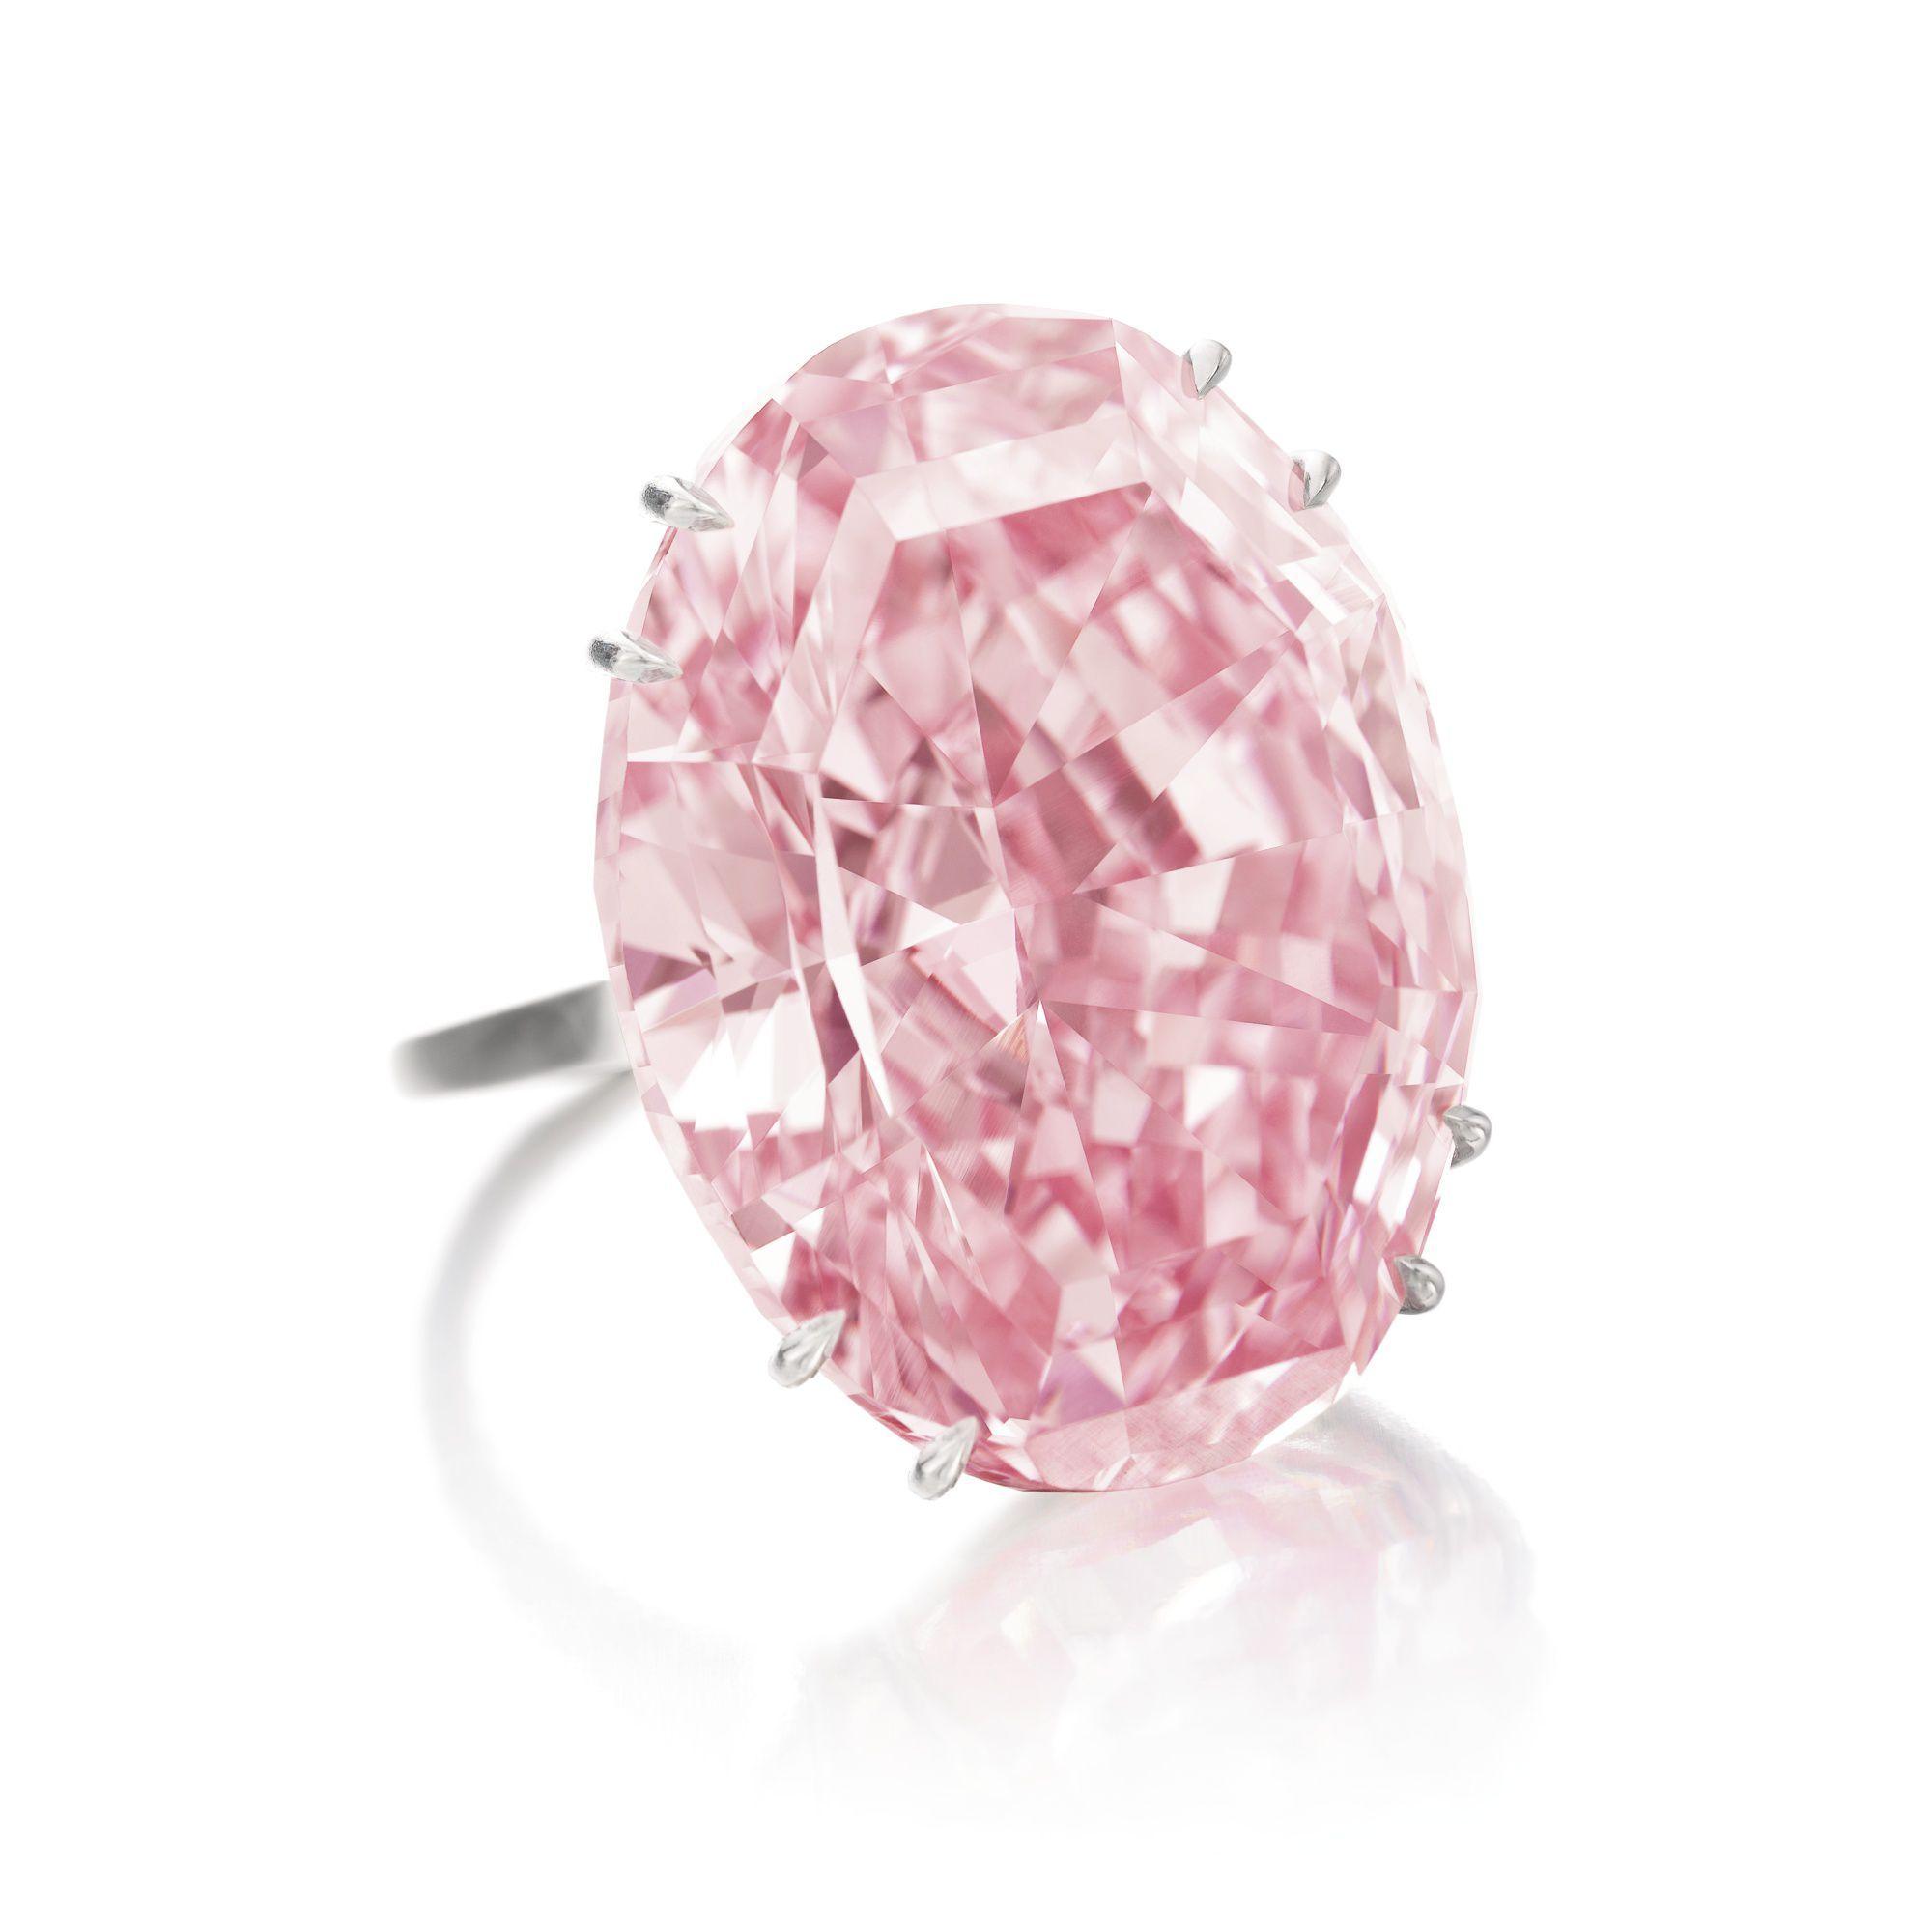 Pin by simona pascariu on life & crystals | Pinterest | Crystals